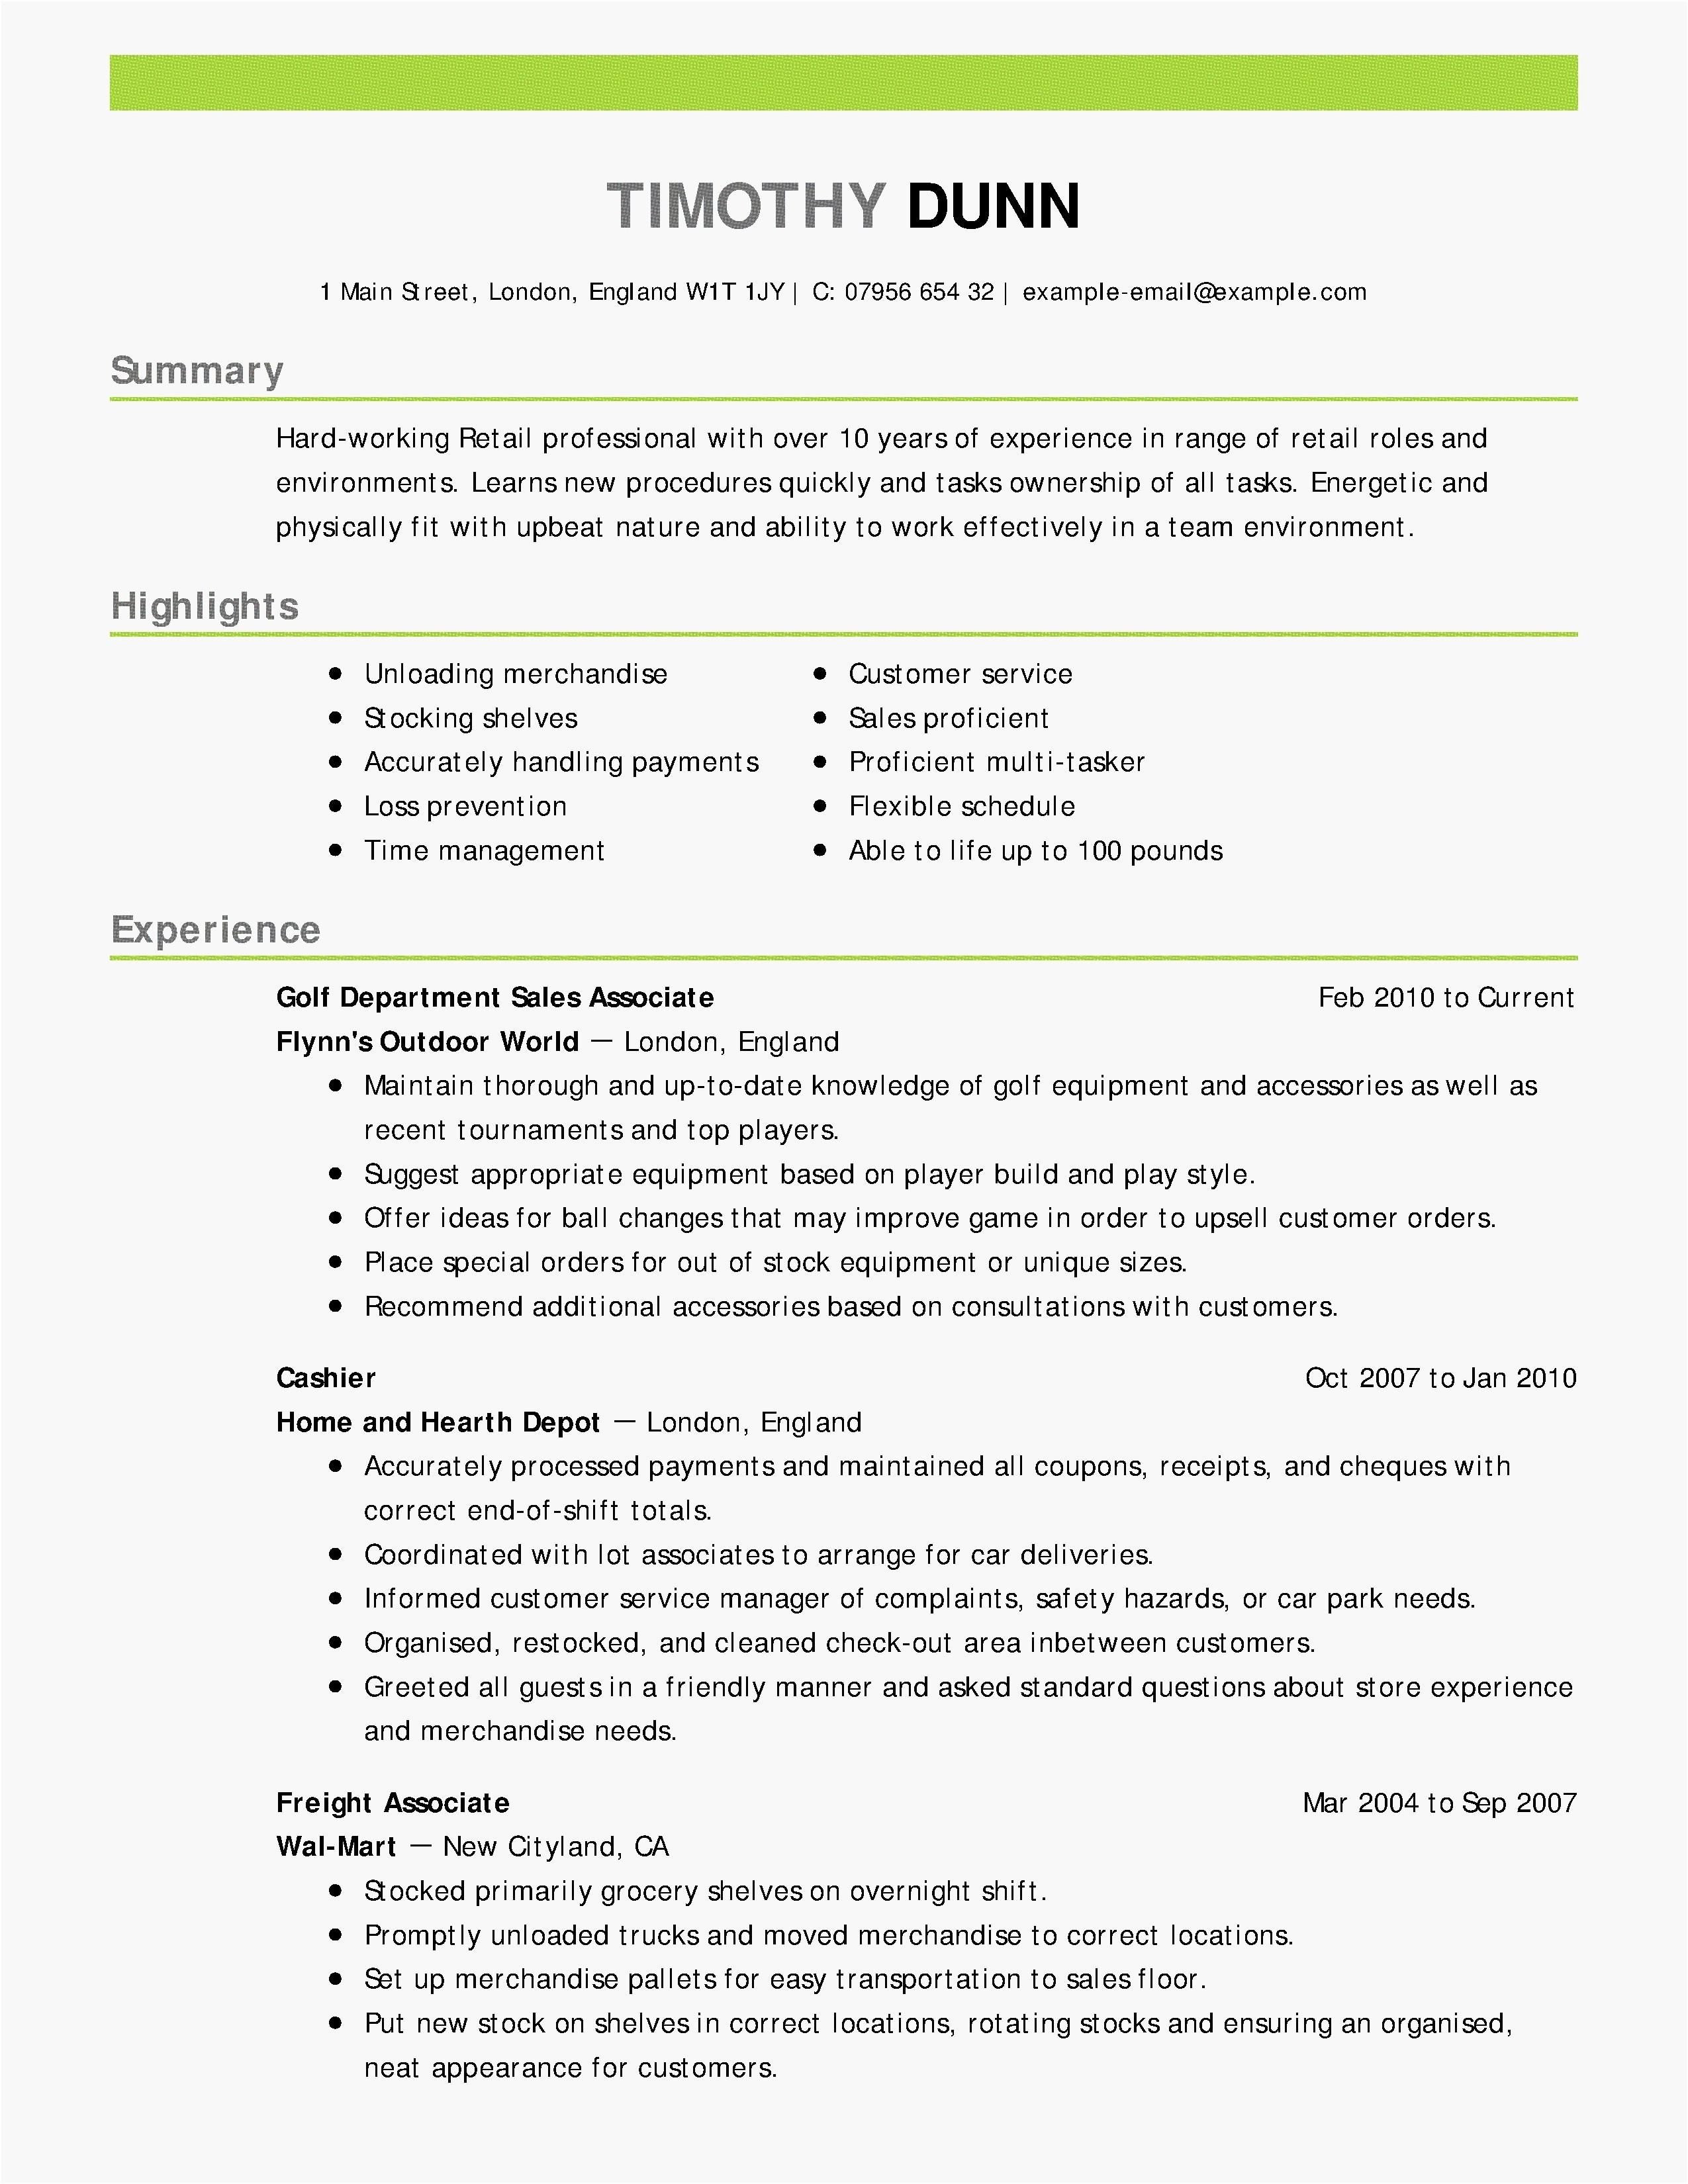 Entry Level Cover Letter Template Free - Fix My Resume Lovely Fresh Entry Level Resume sorority Resume 0d How